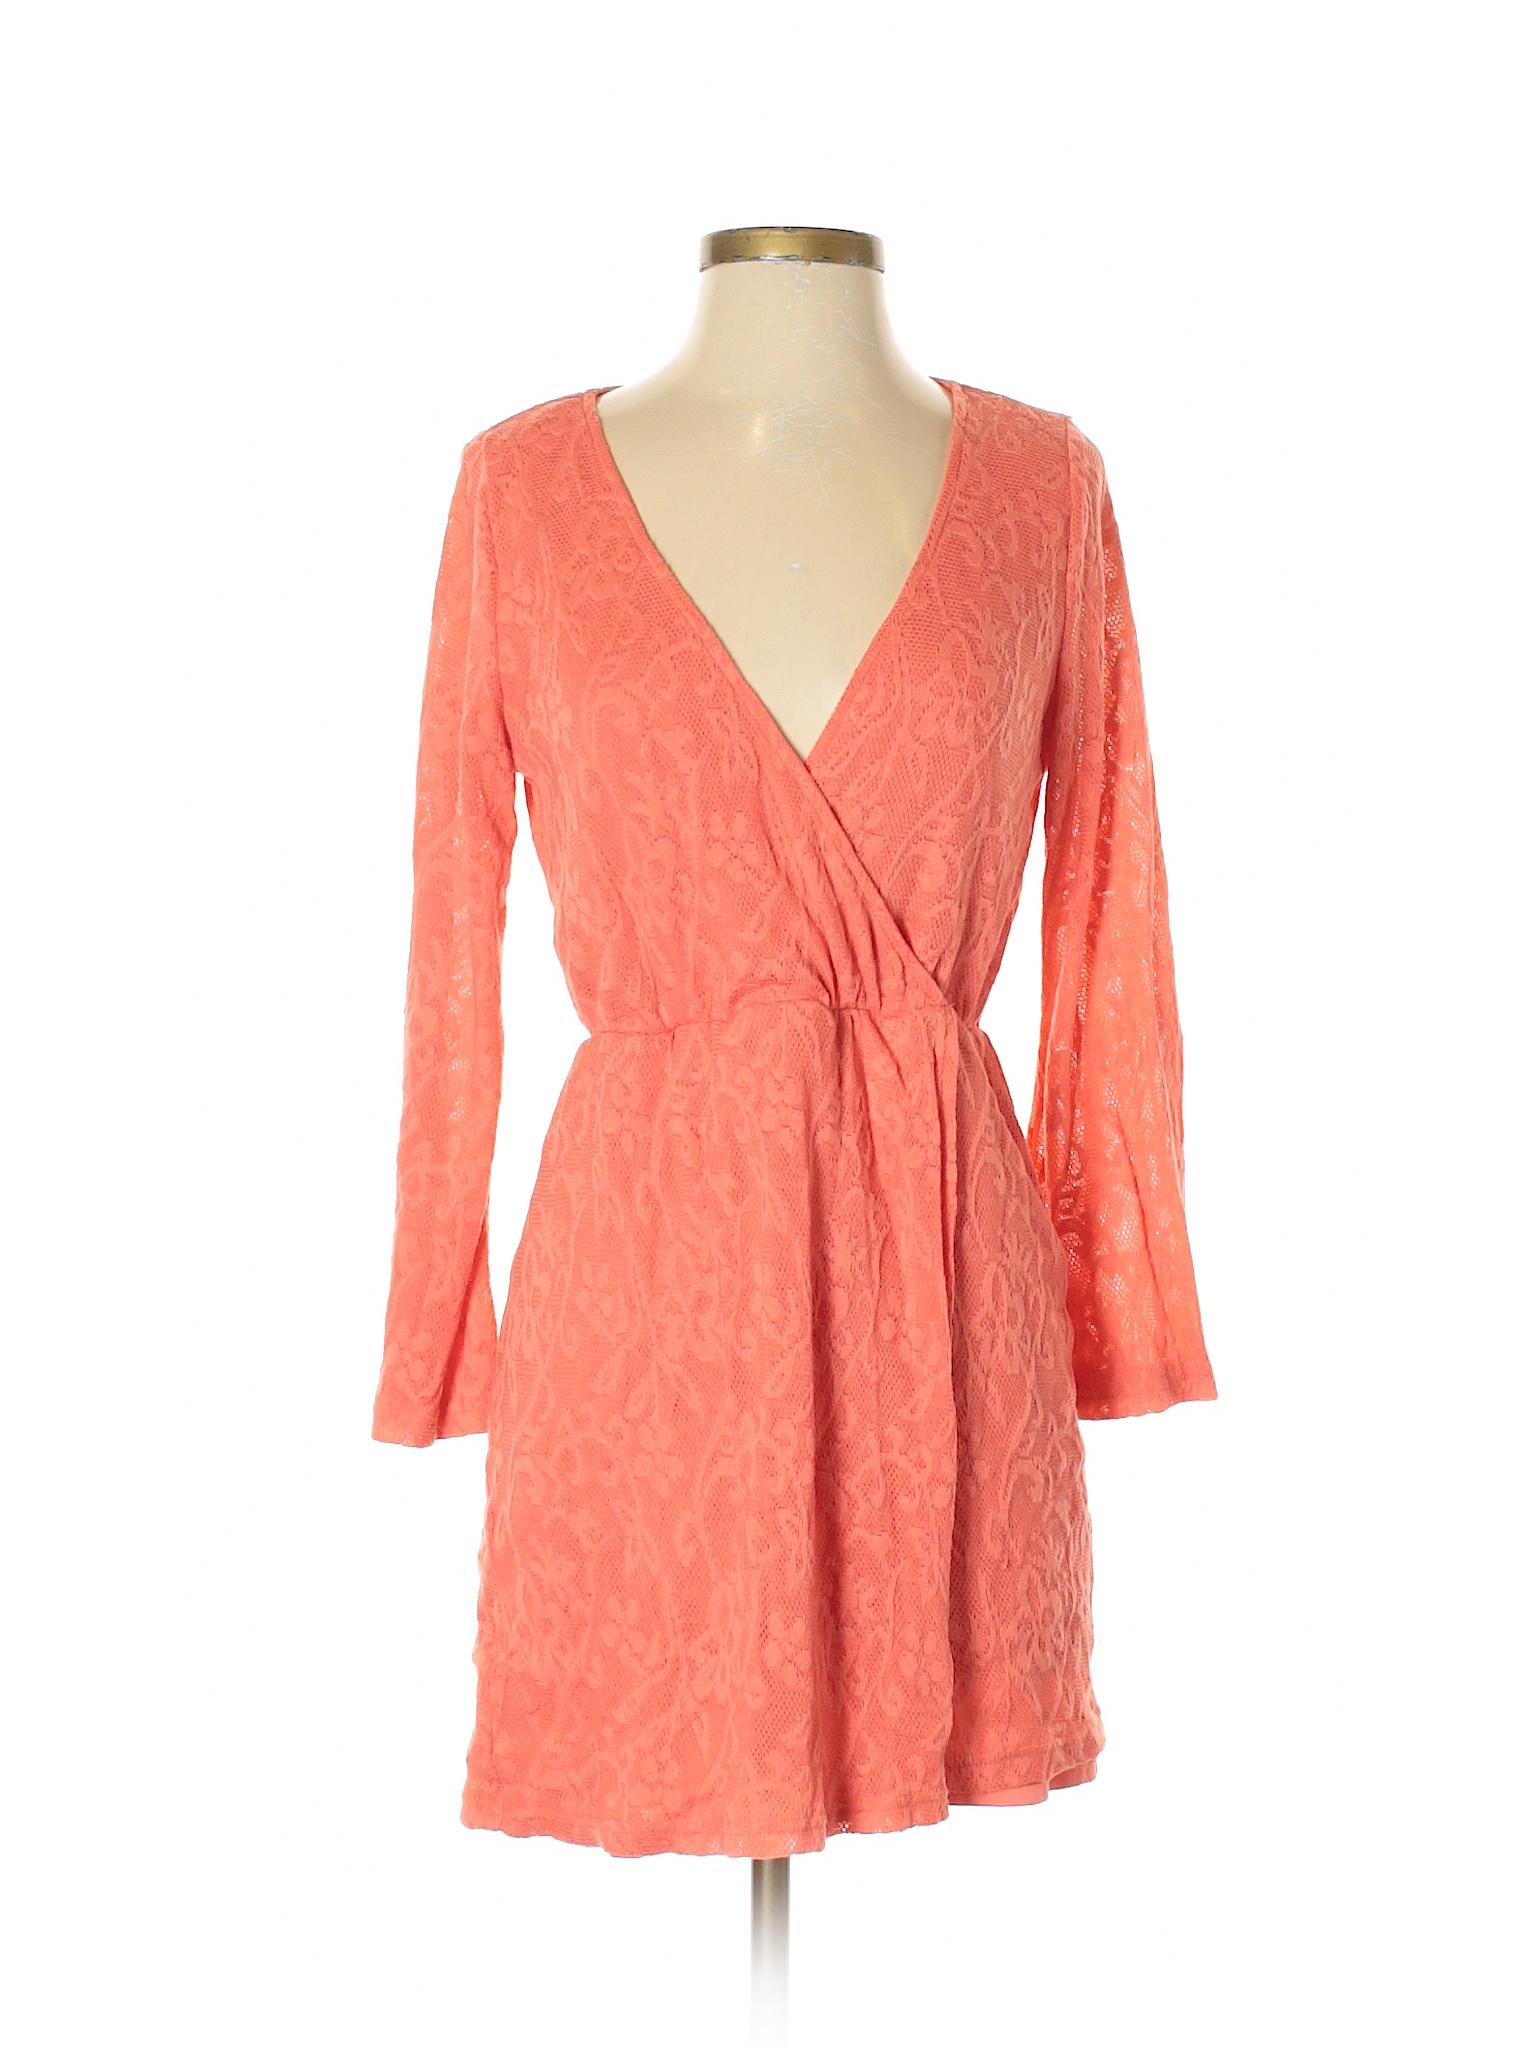 Punch winter Dress Boutique Honey Casual 4wqzWOEH